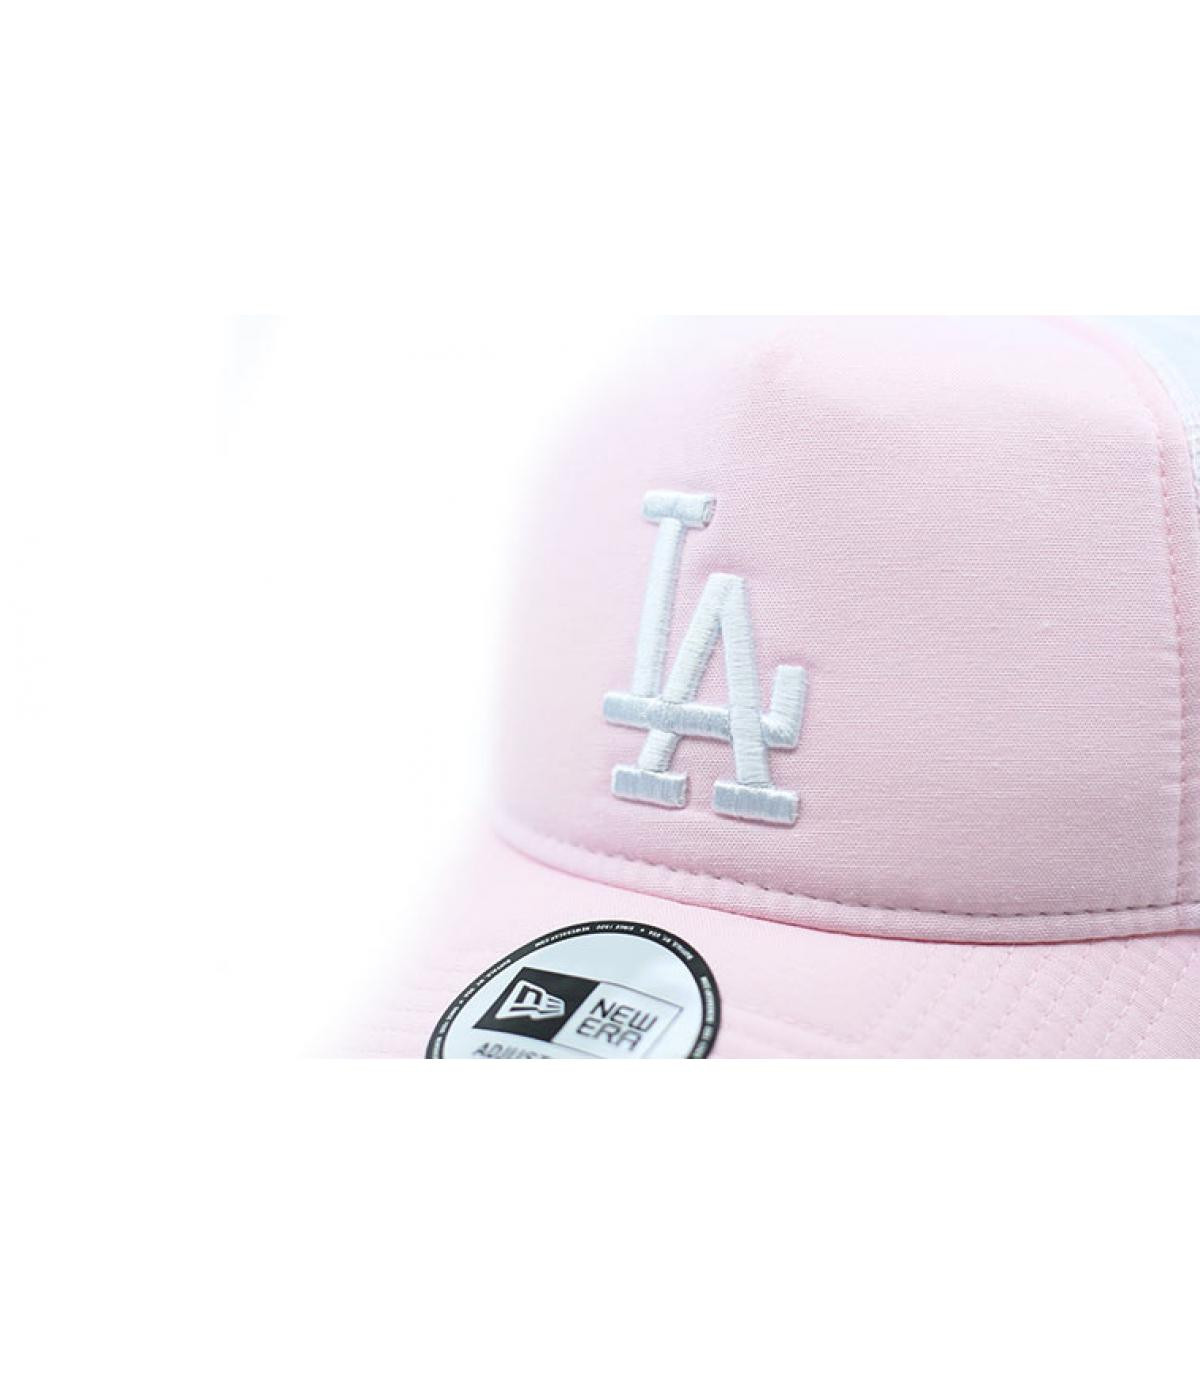 Detalles MLB Oxford LA pink imagen 3